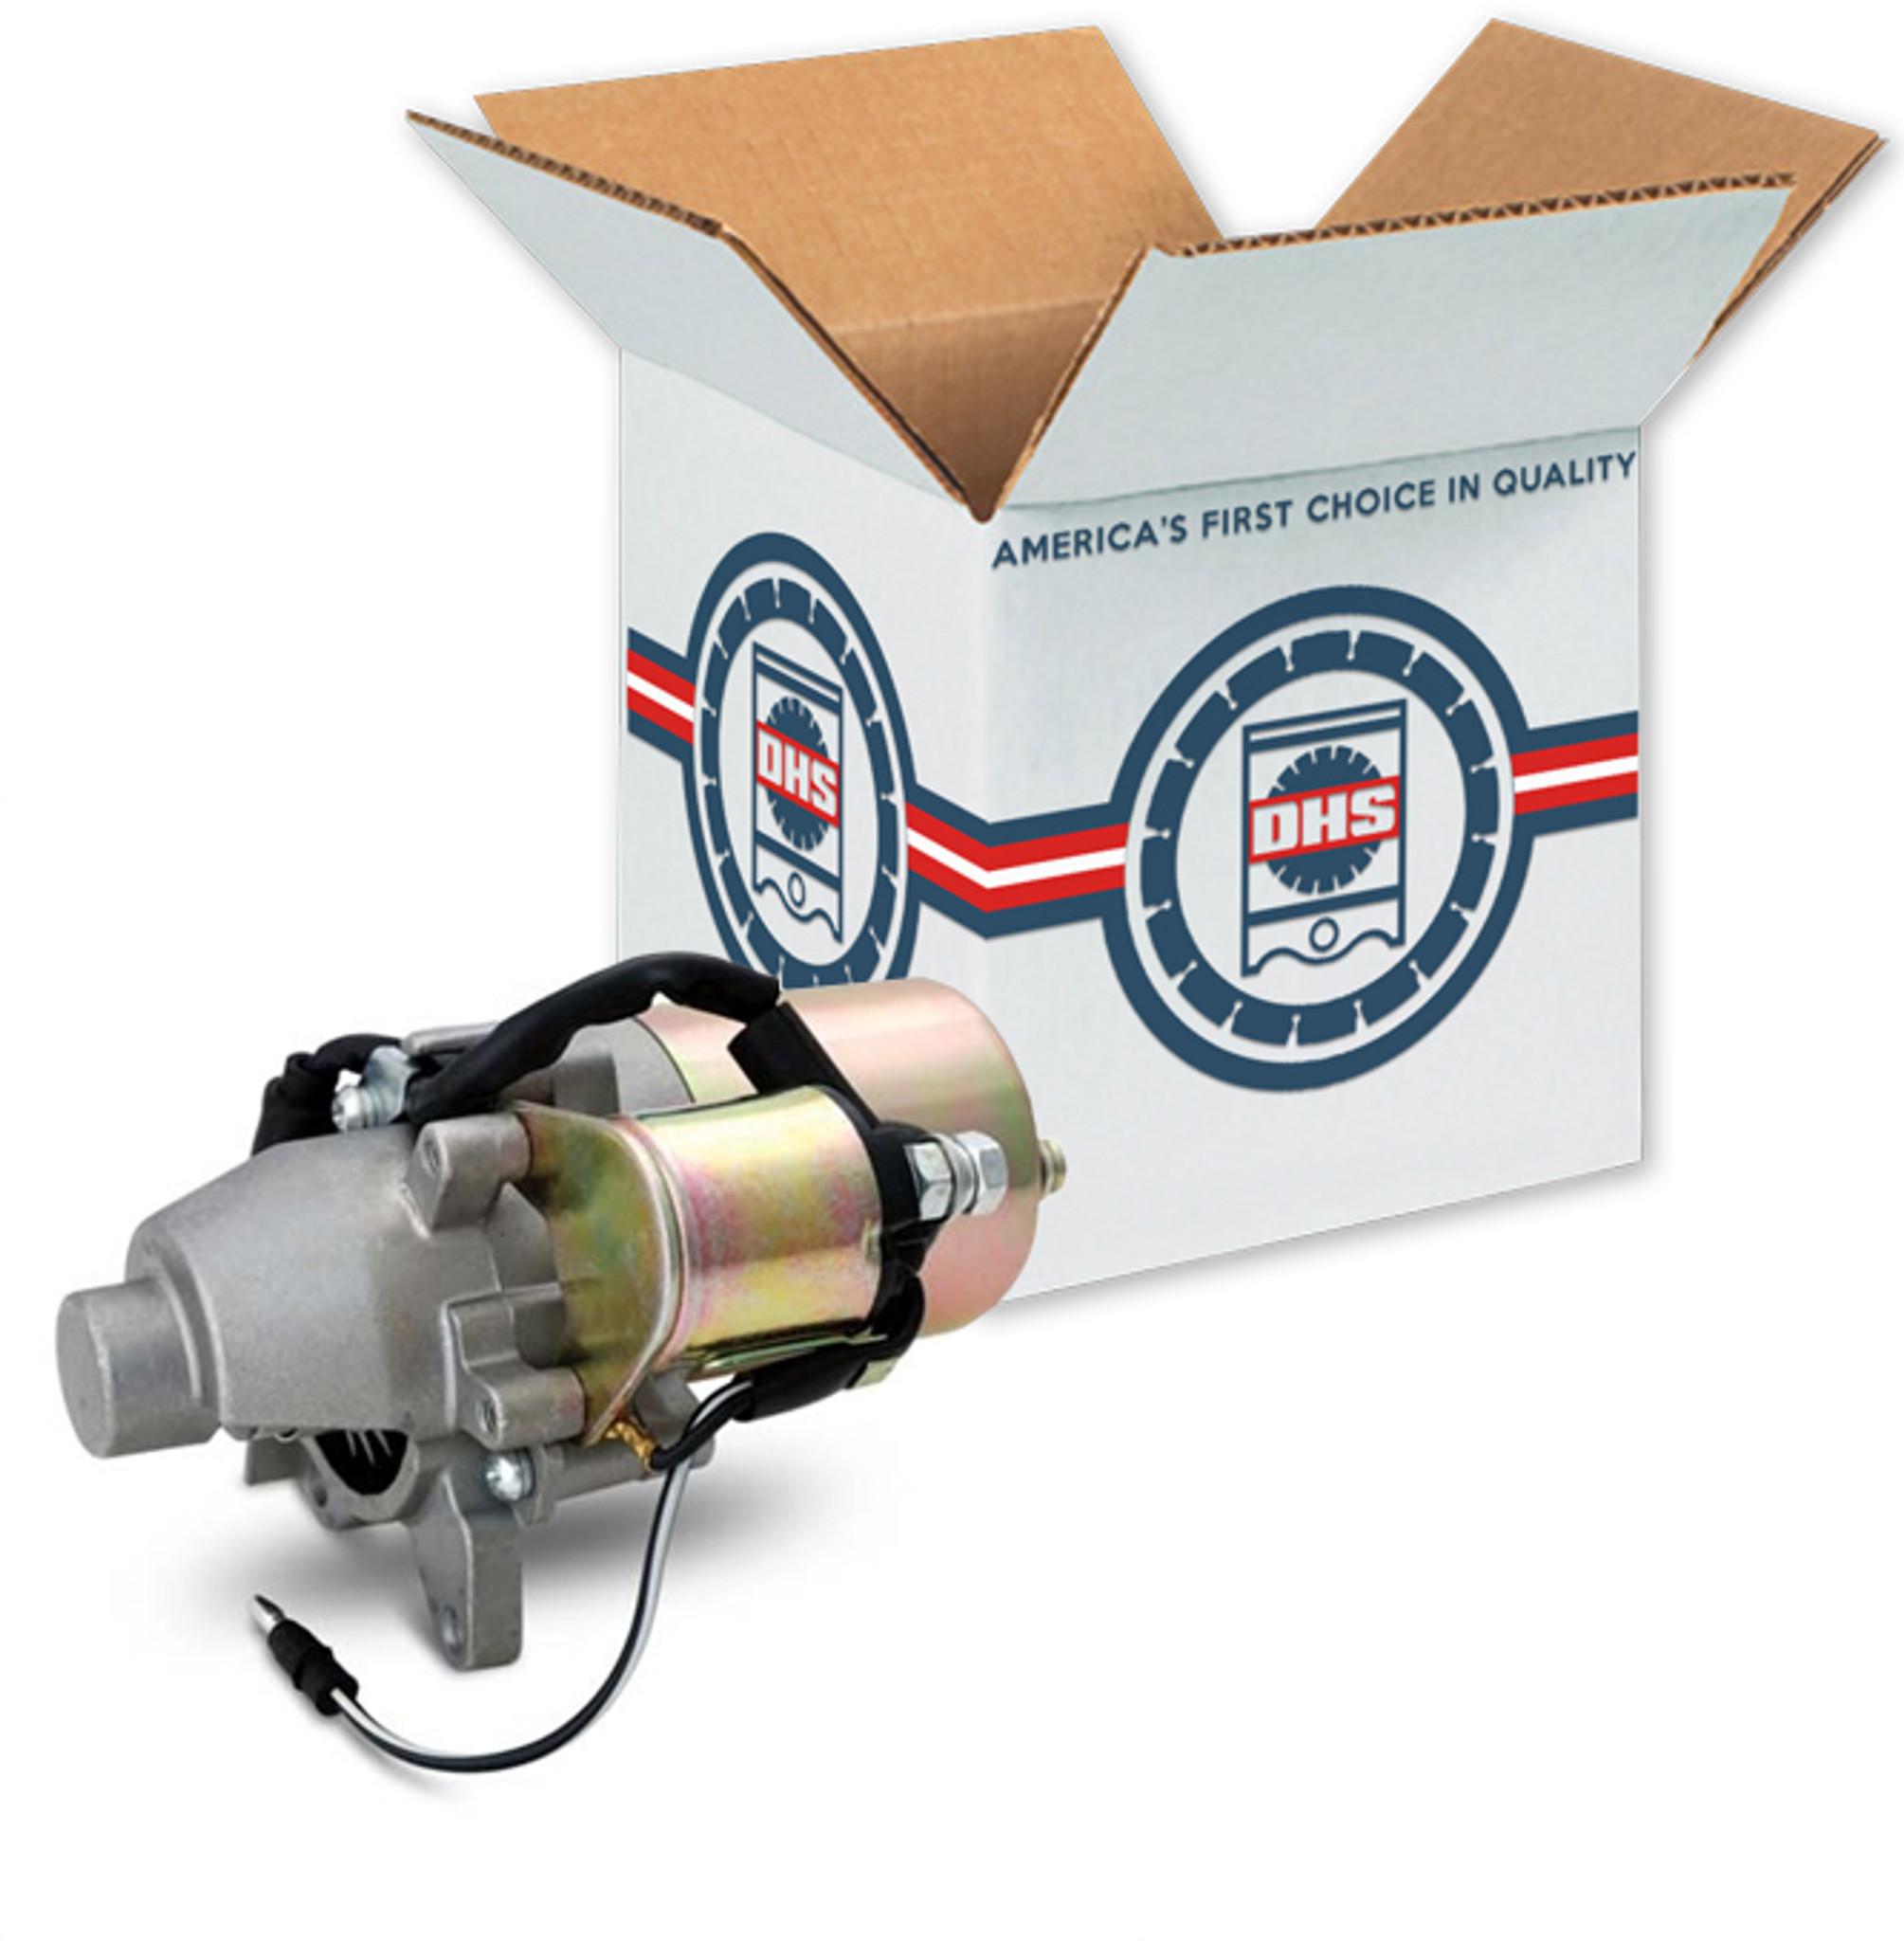 Honda gx160 gx200 electric starter motor 31210 ze1 023 for Honda motor credit payoff